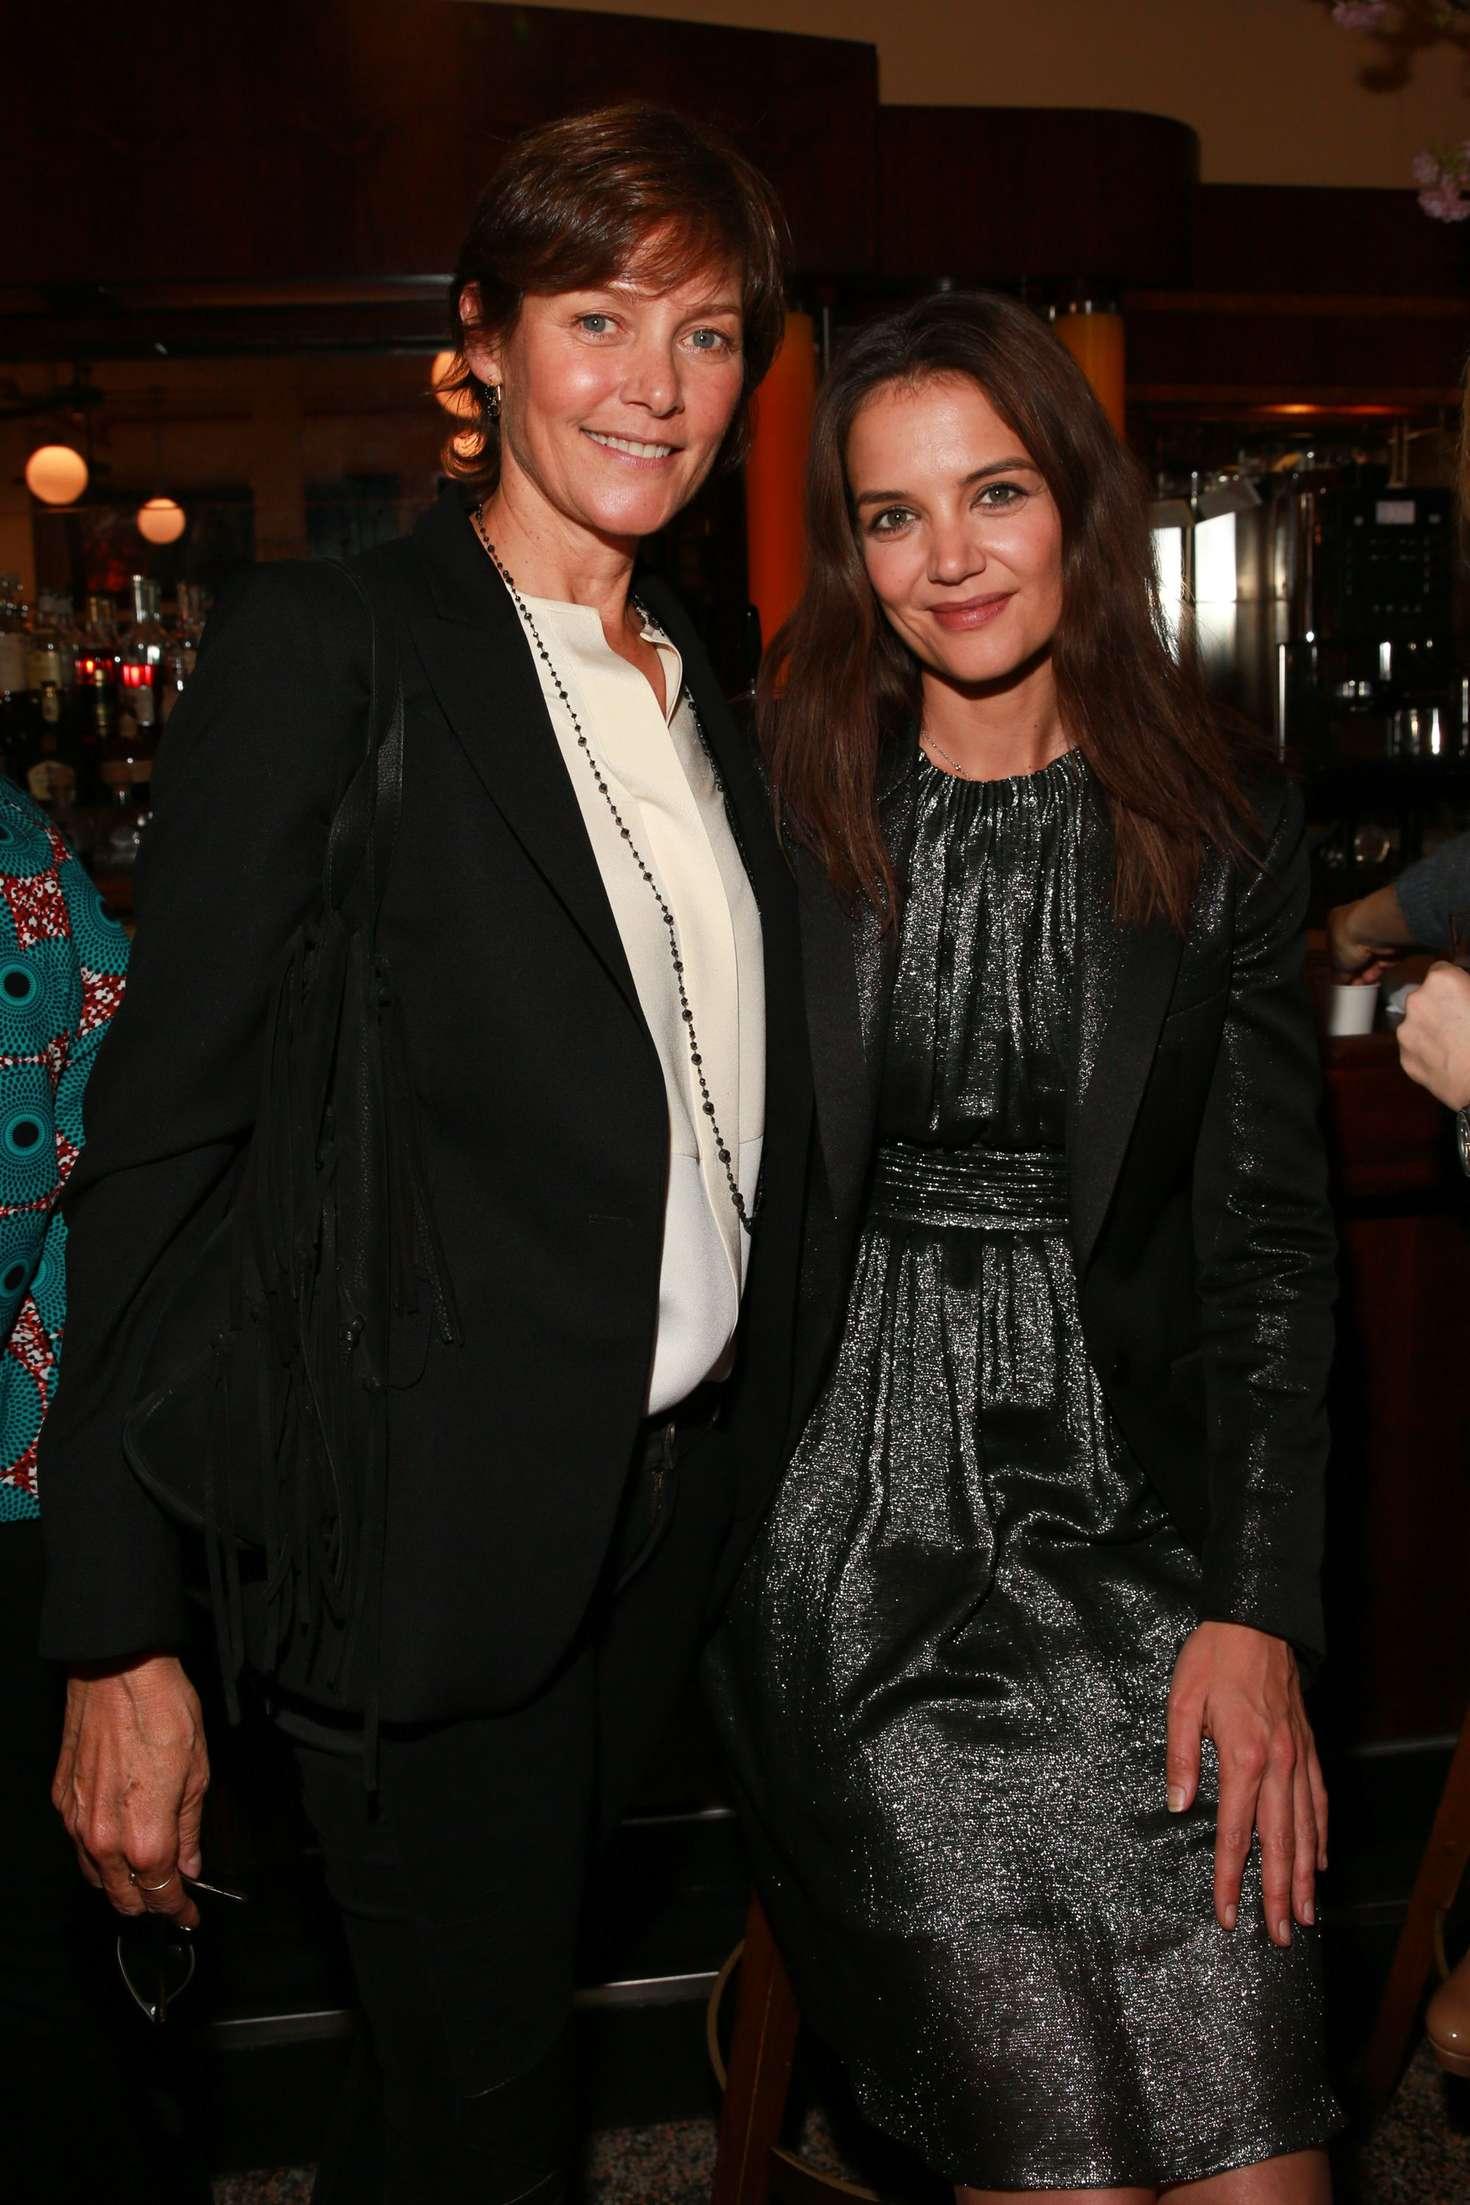 Katie Holmes 2016 : Katie Holmes: Women Filmmakers Luncheon at Tribeca Film Festival 2016 -11